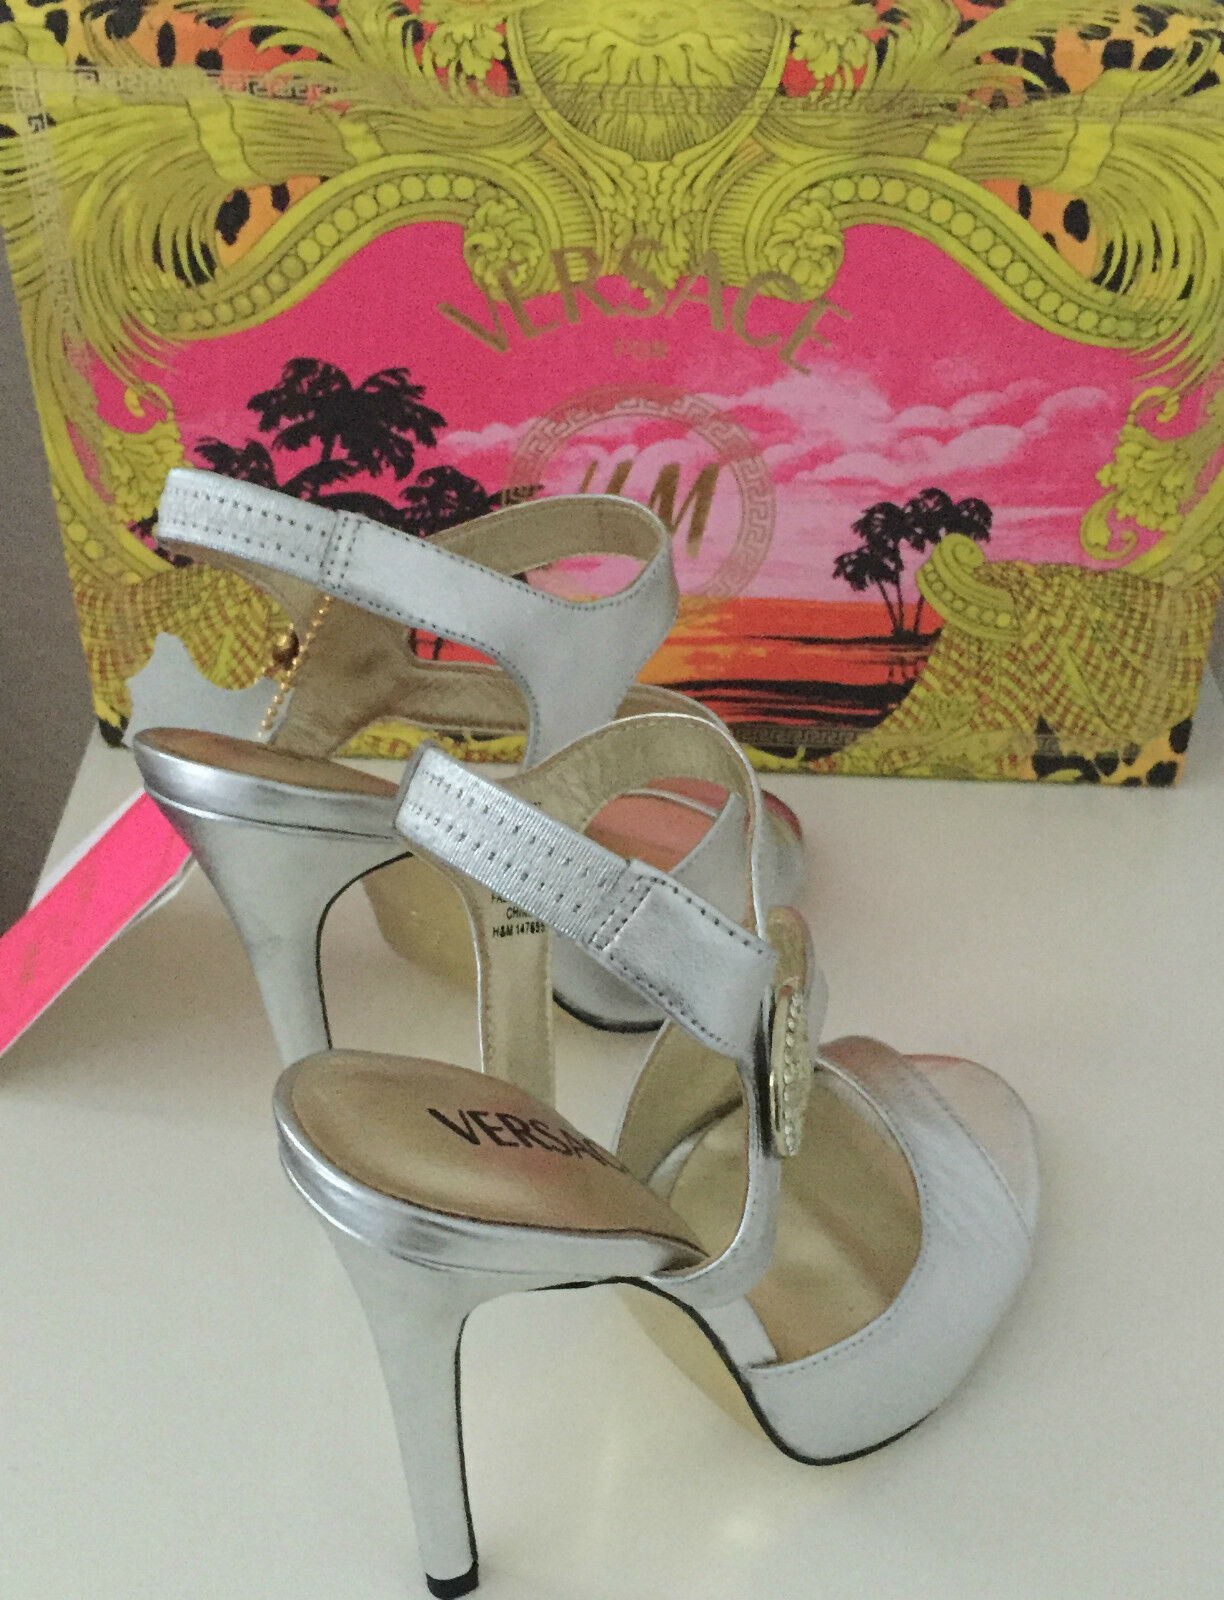 Versace Stilettos High Heels Schuhe Silver EUR 37 38 39 40 US 6 7 8 9 UK 4 5 6 7